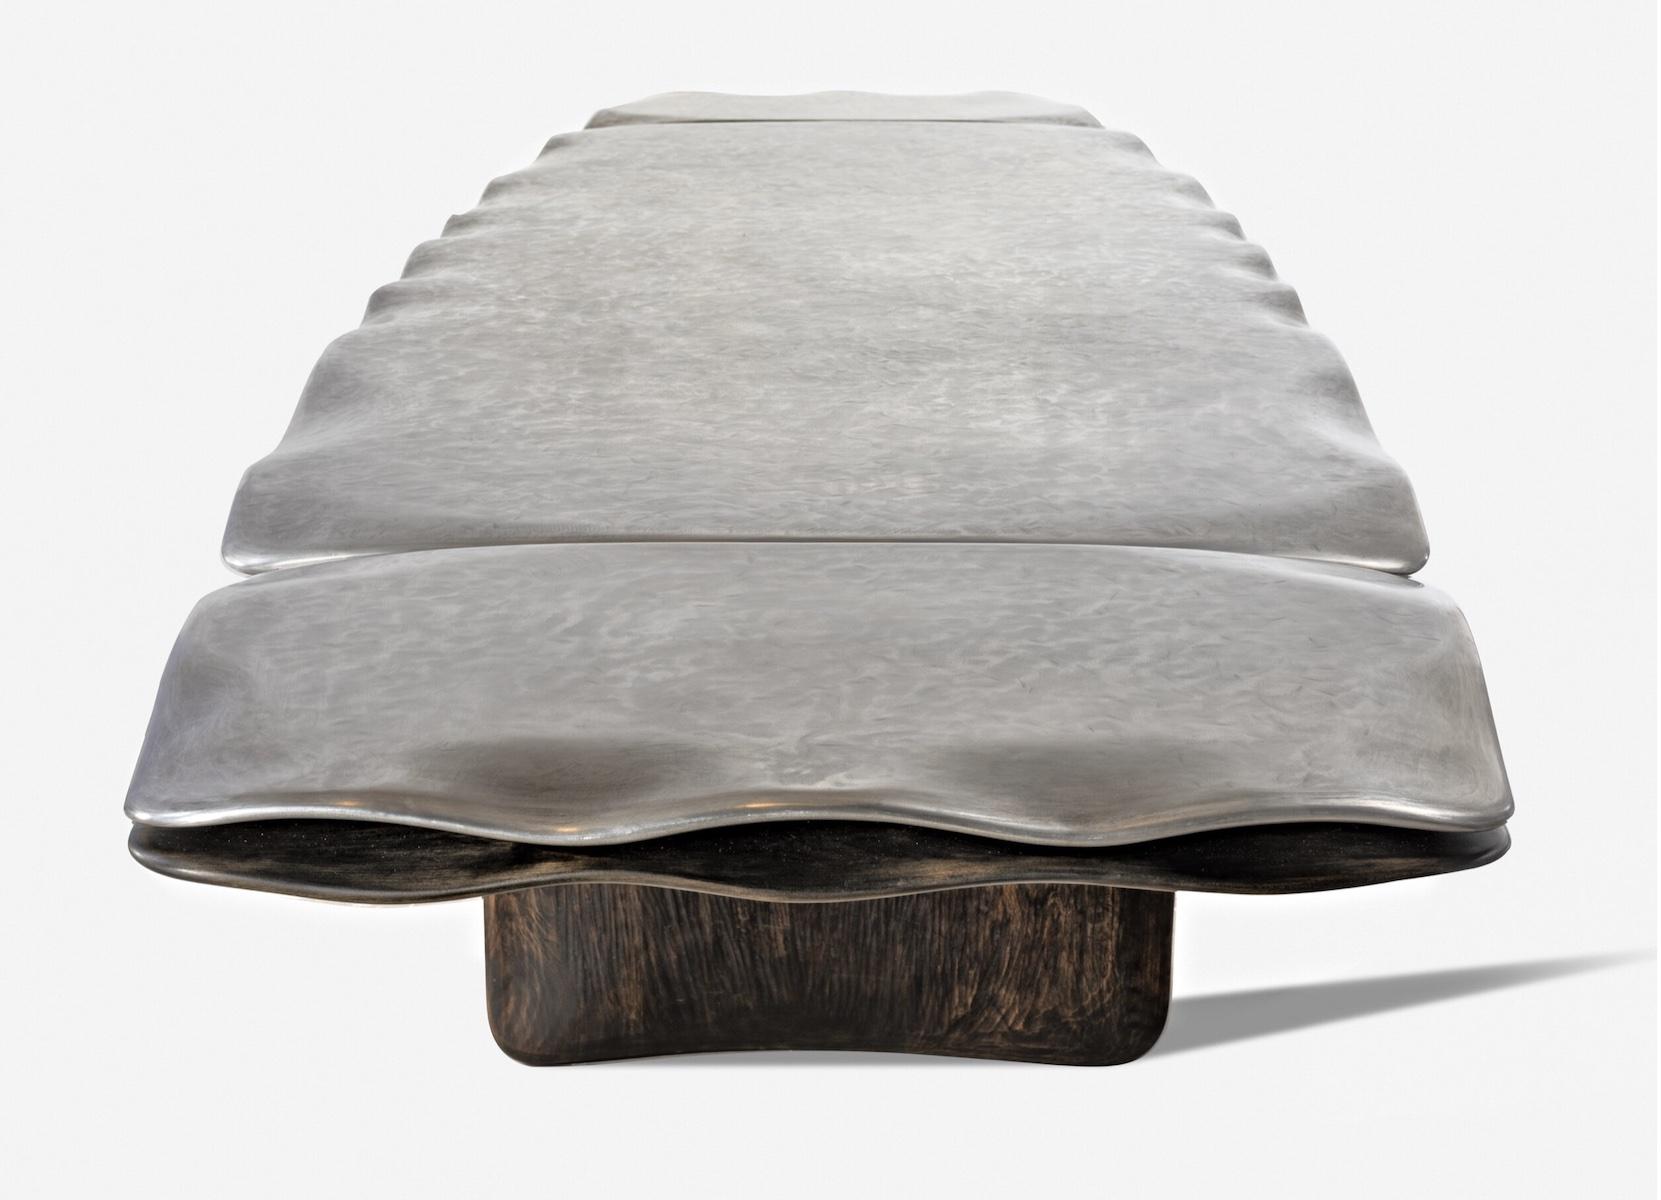 Top view of the Park Avenue Table by artist Christopher Kurtz